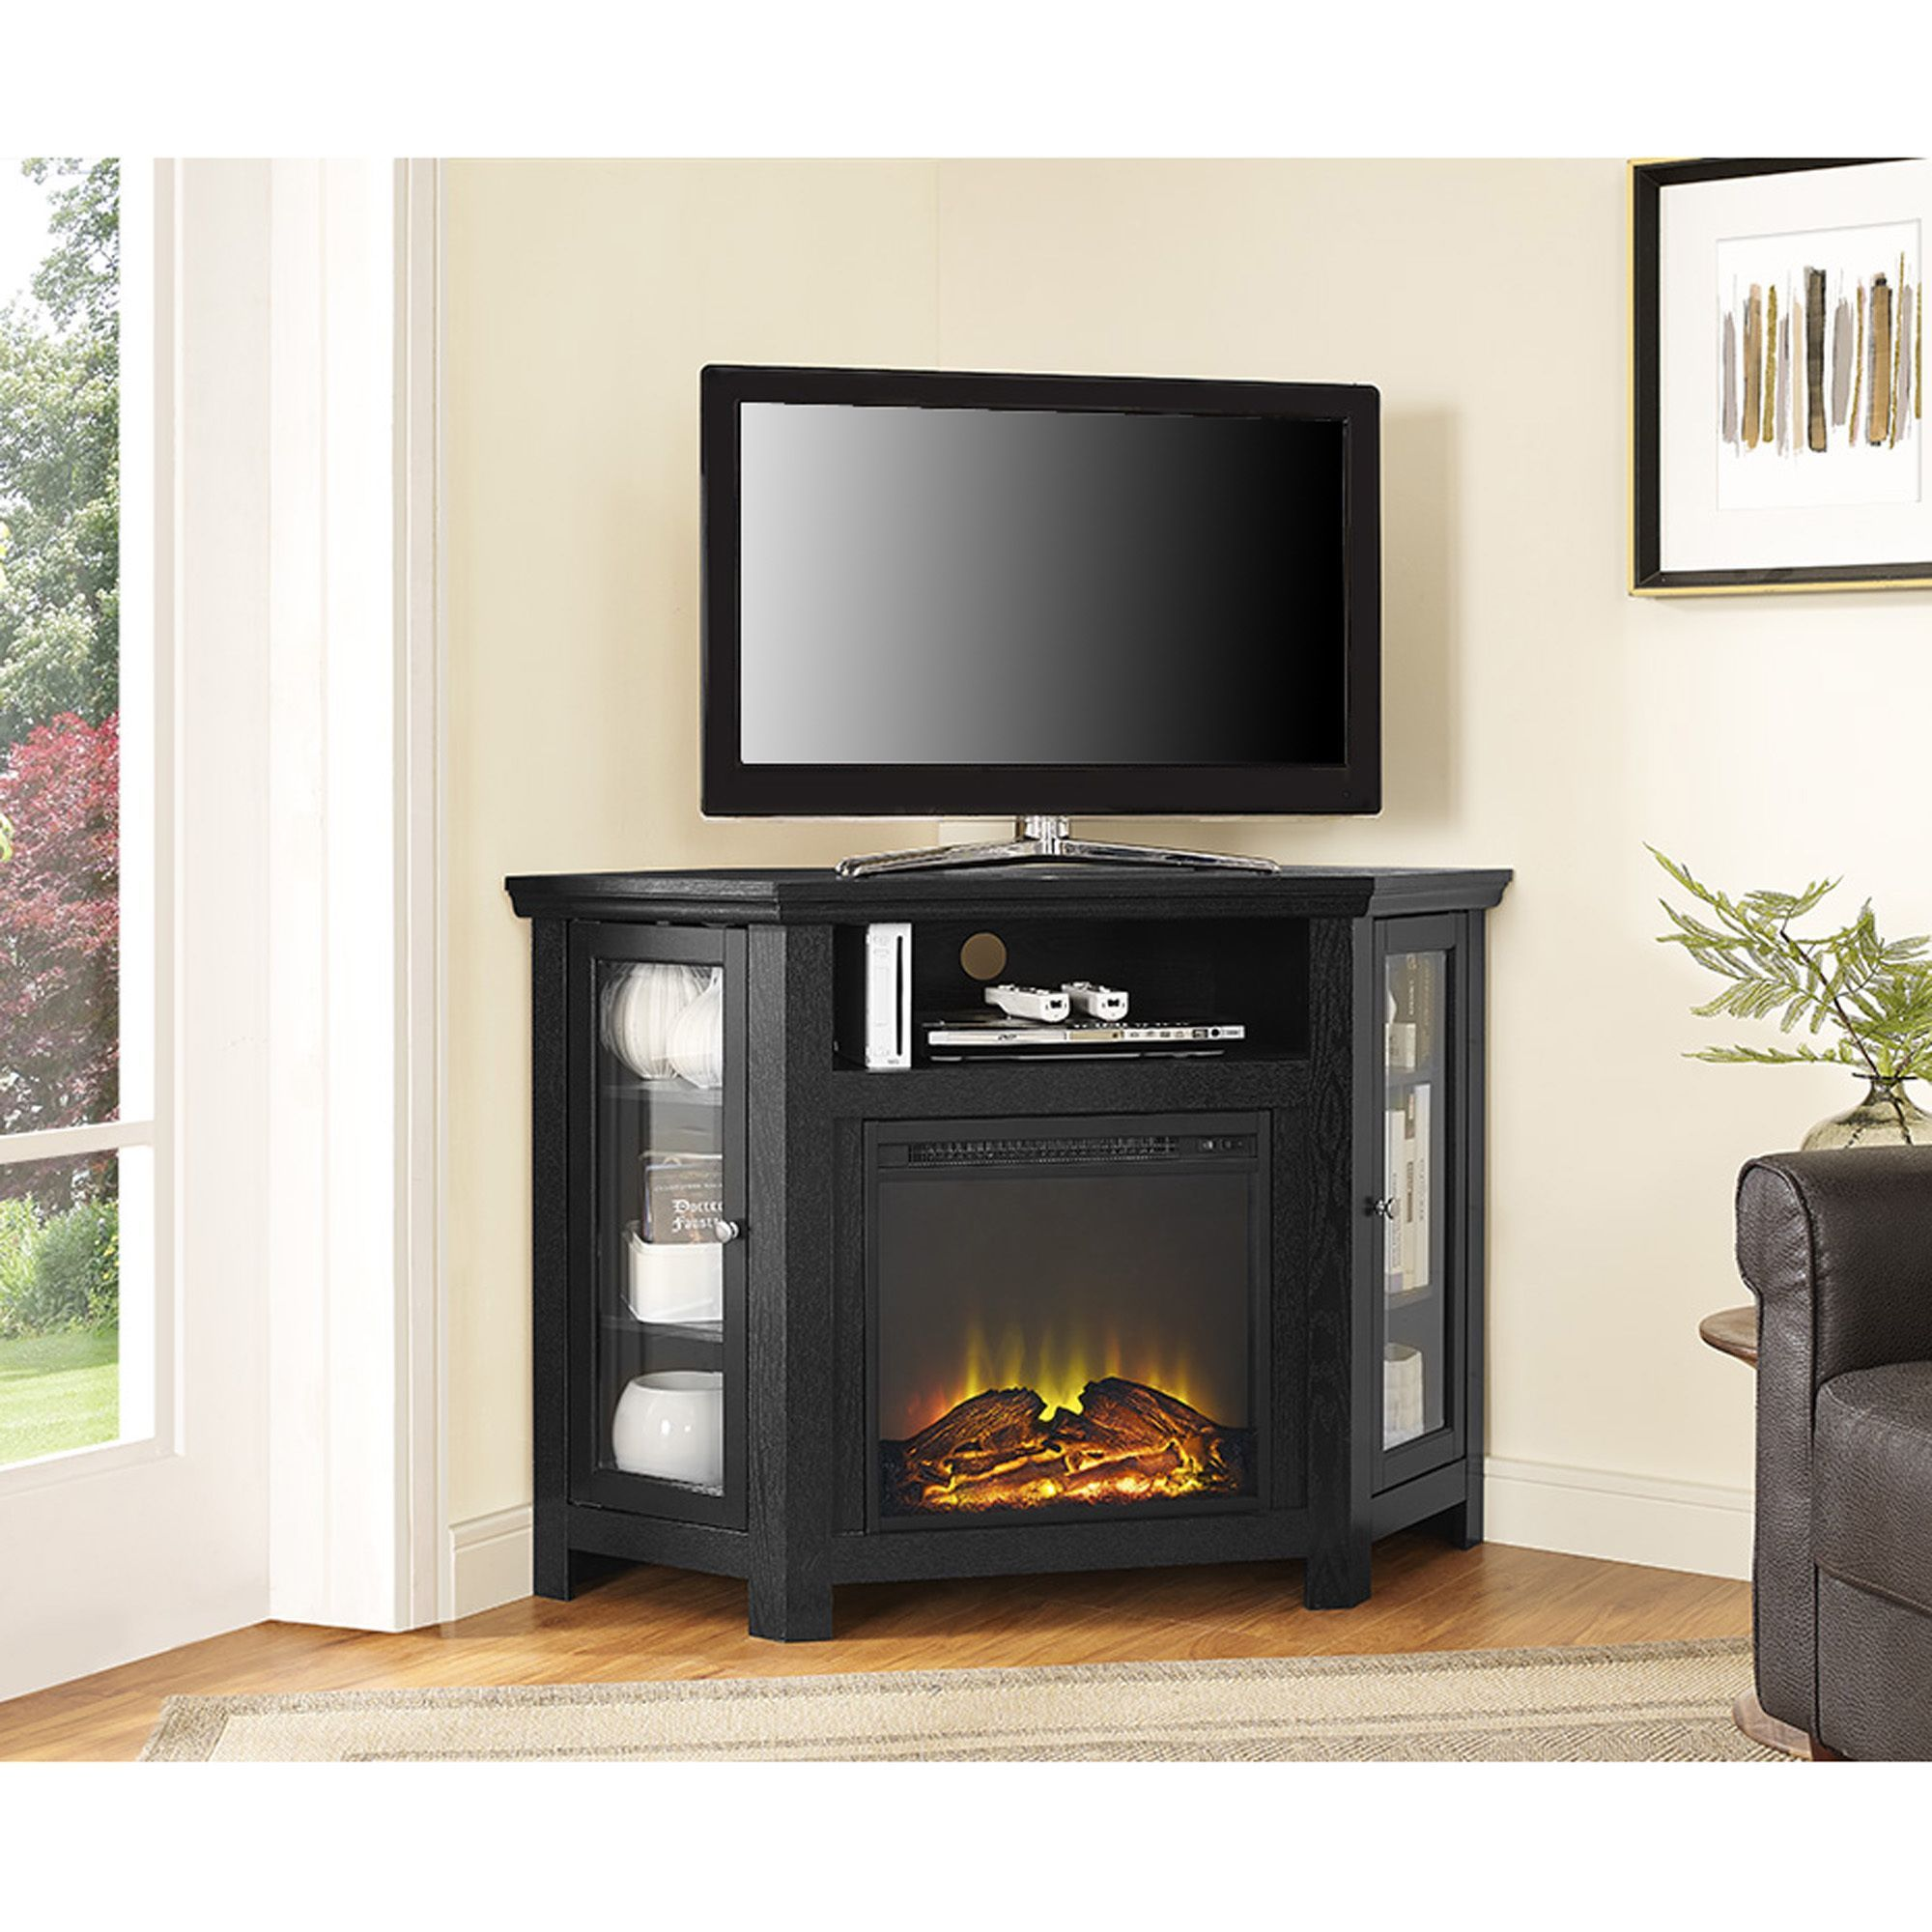 product conversion vent procom prevnav photo propane freestanding fireplace dream corner dual fuel baxters